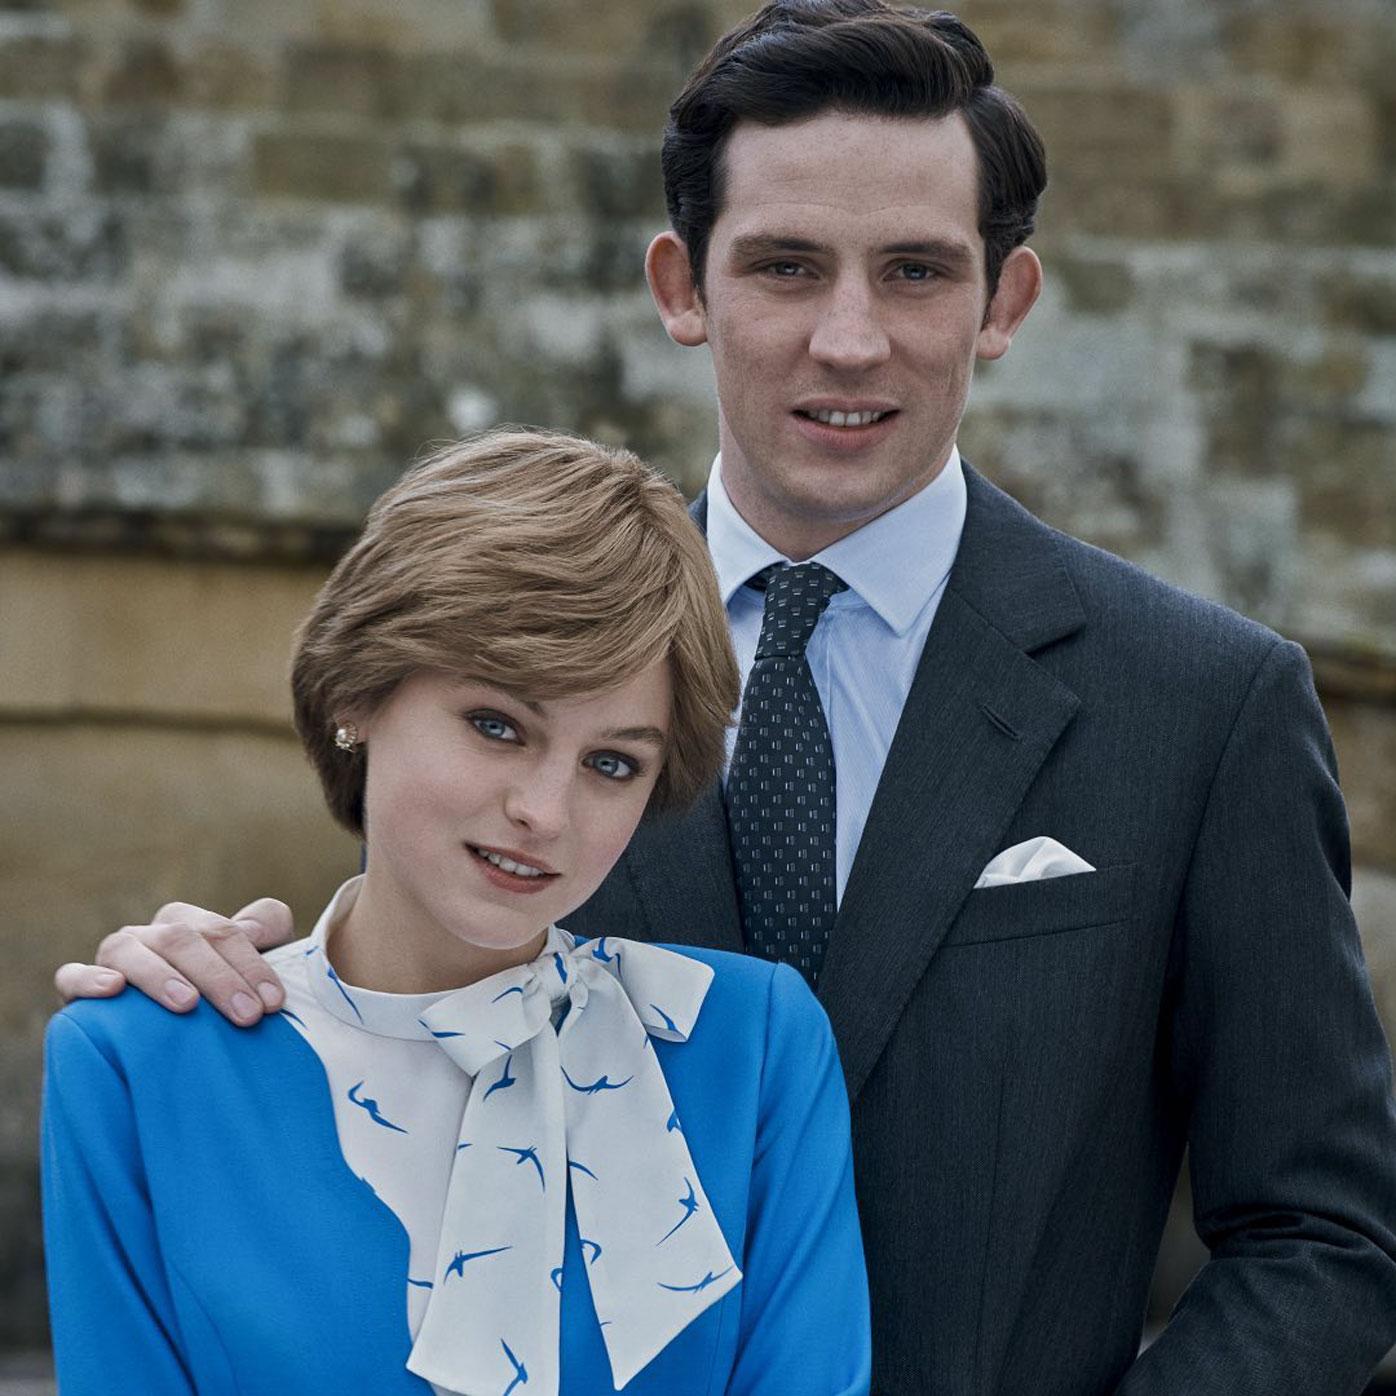 The Crown's Prince Charles and Princess Diana.